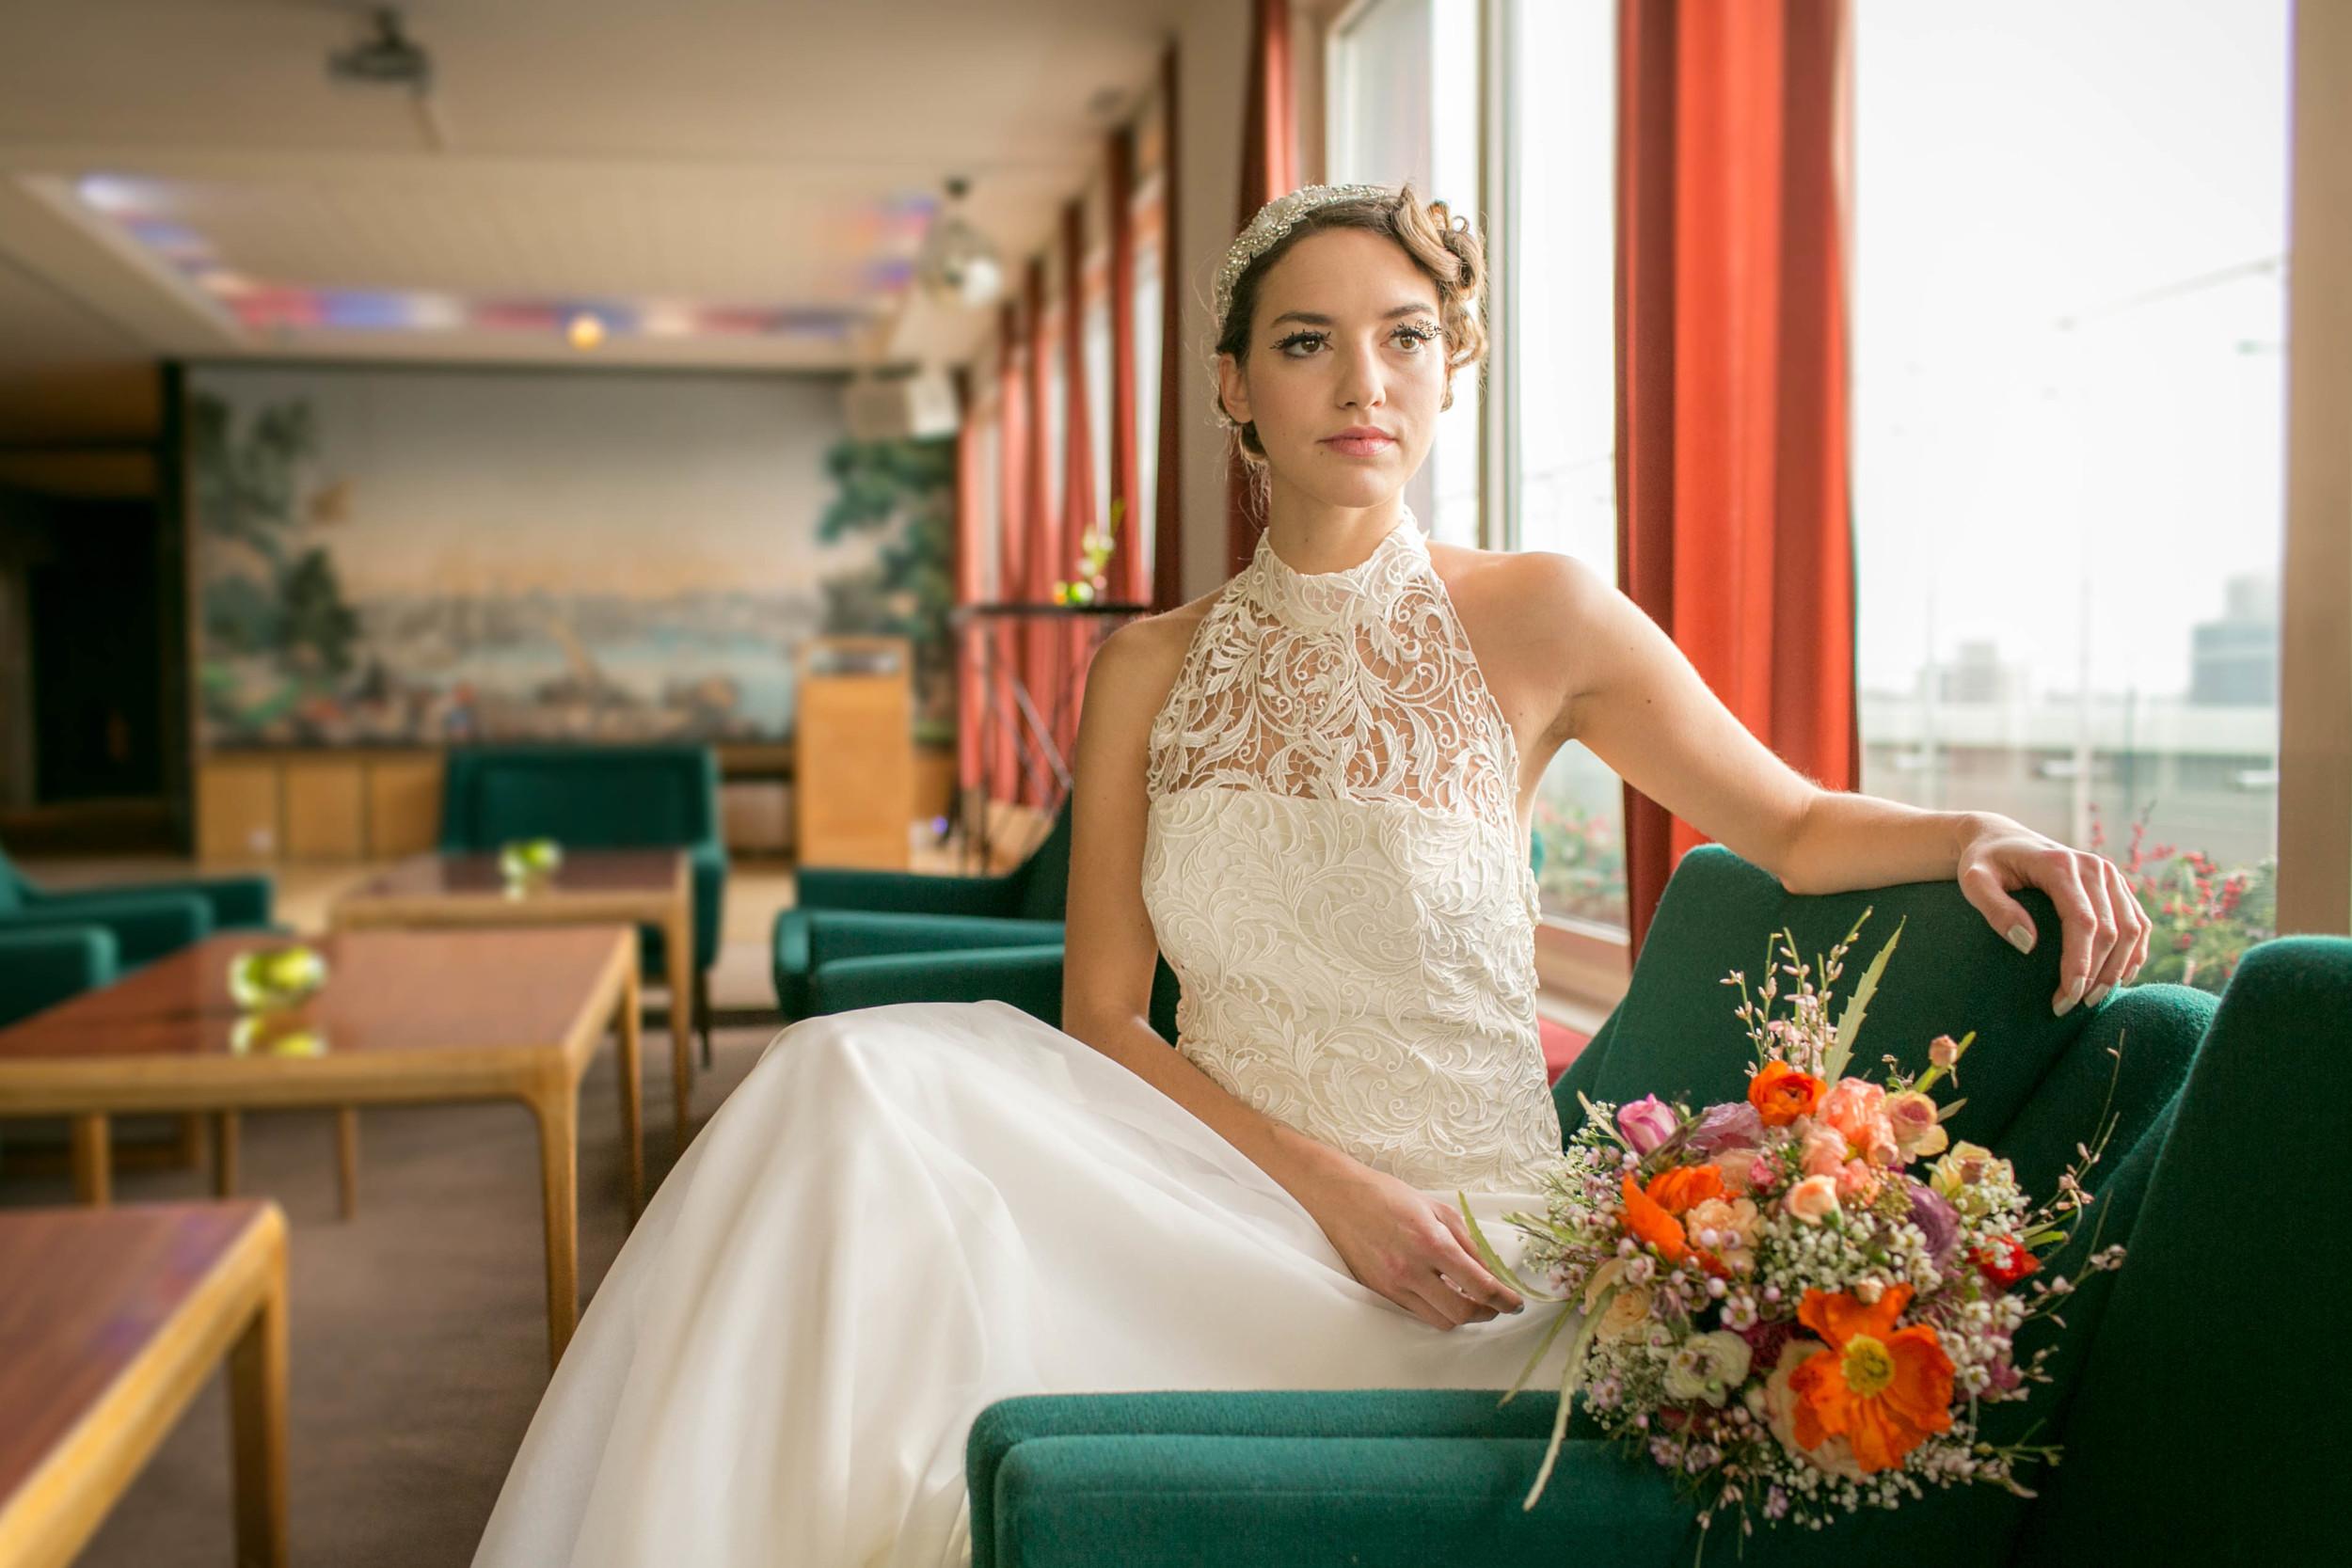 Pan Am Lounge_Hochzeitsfotografie Berlin-11.jpg